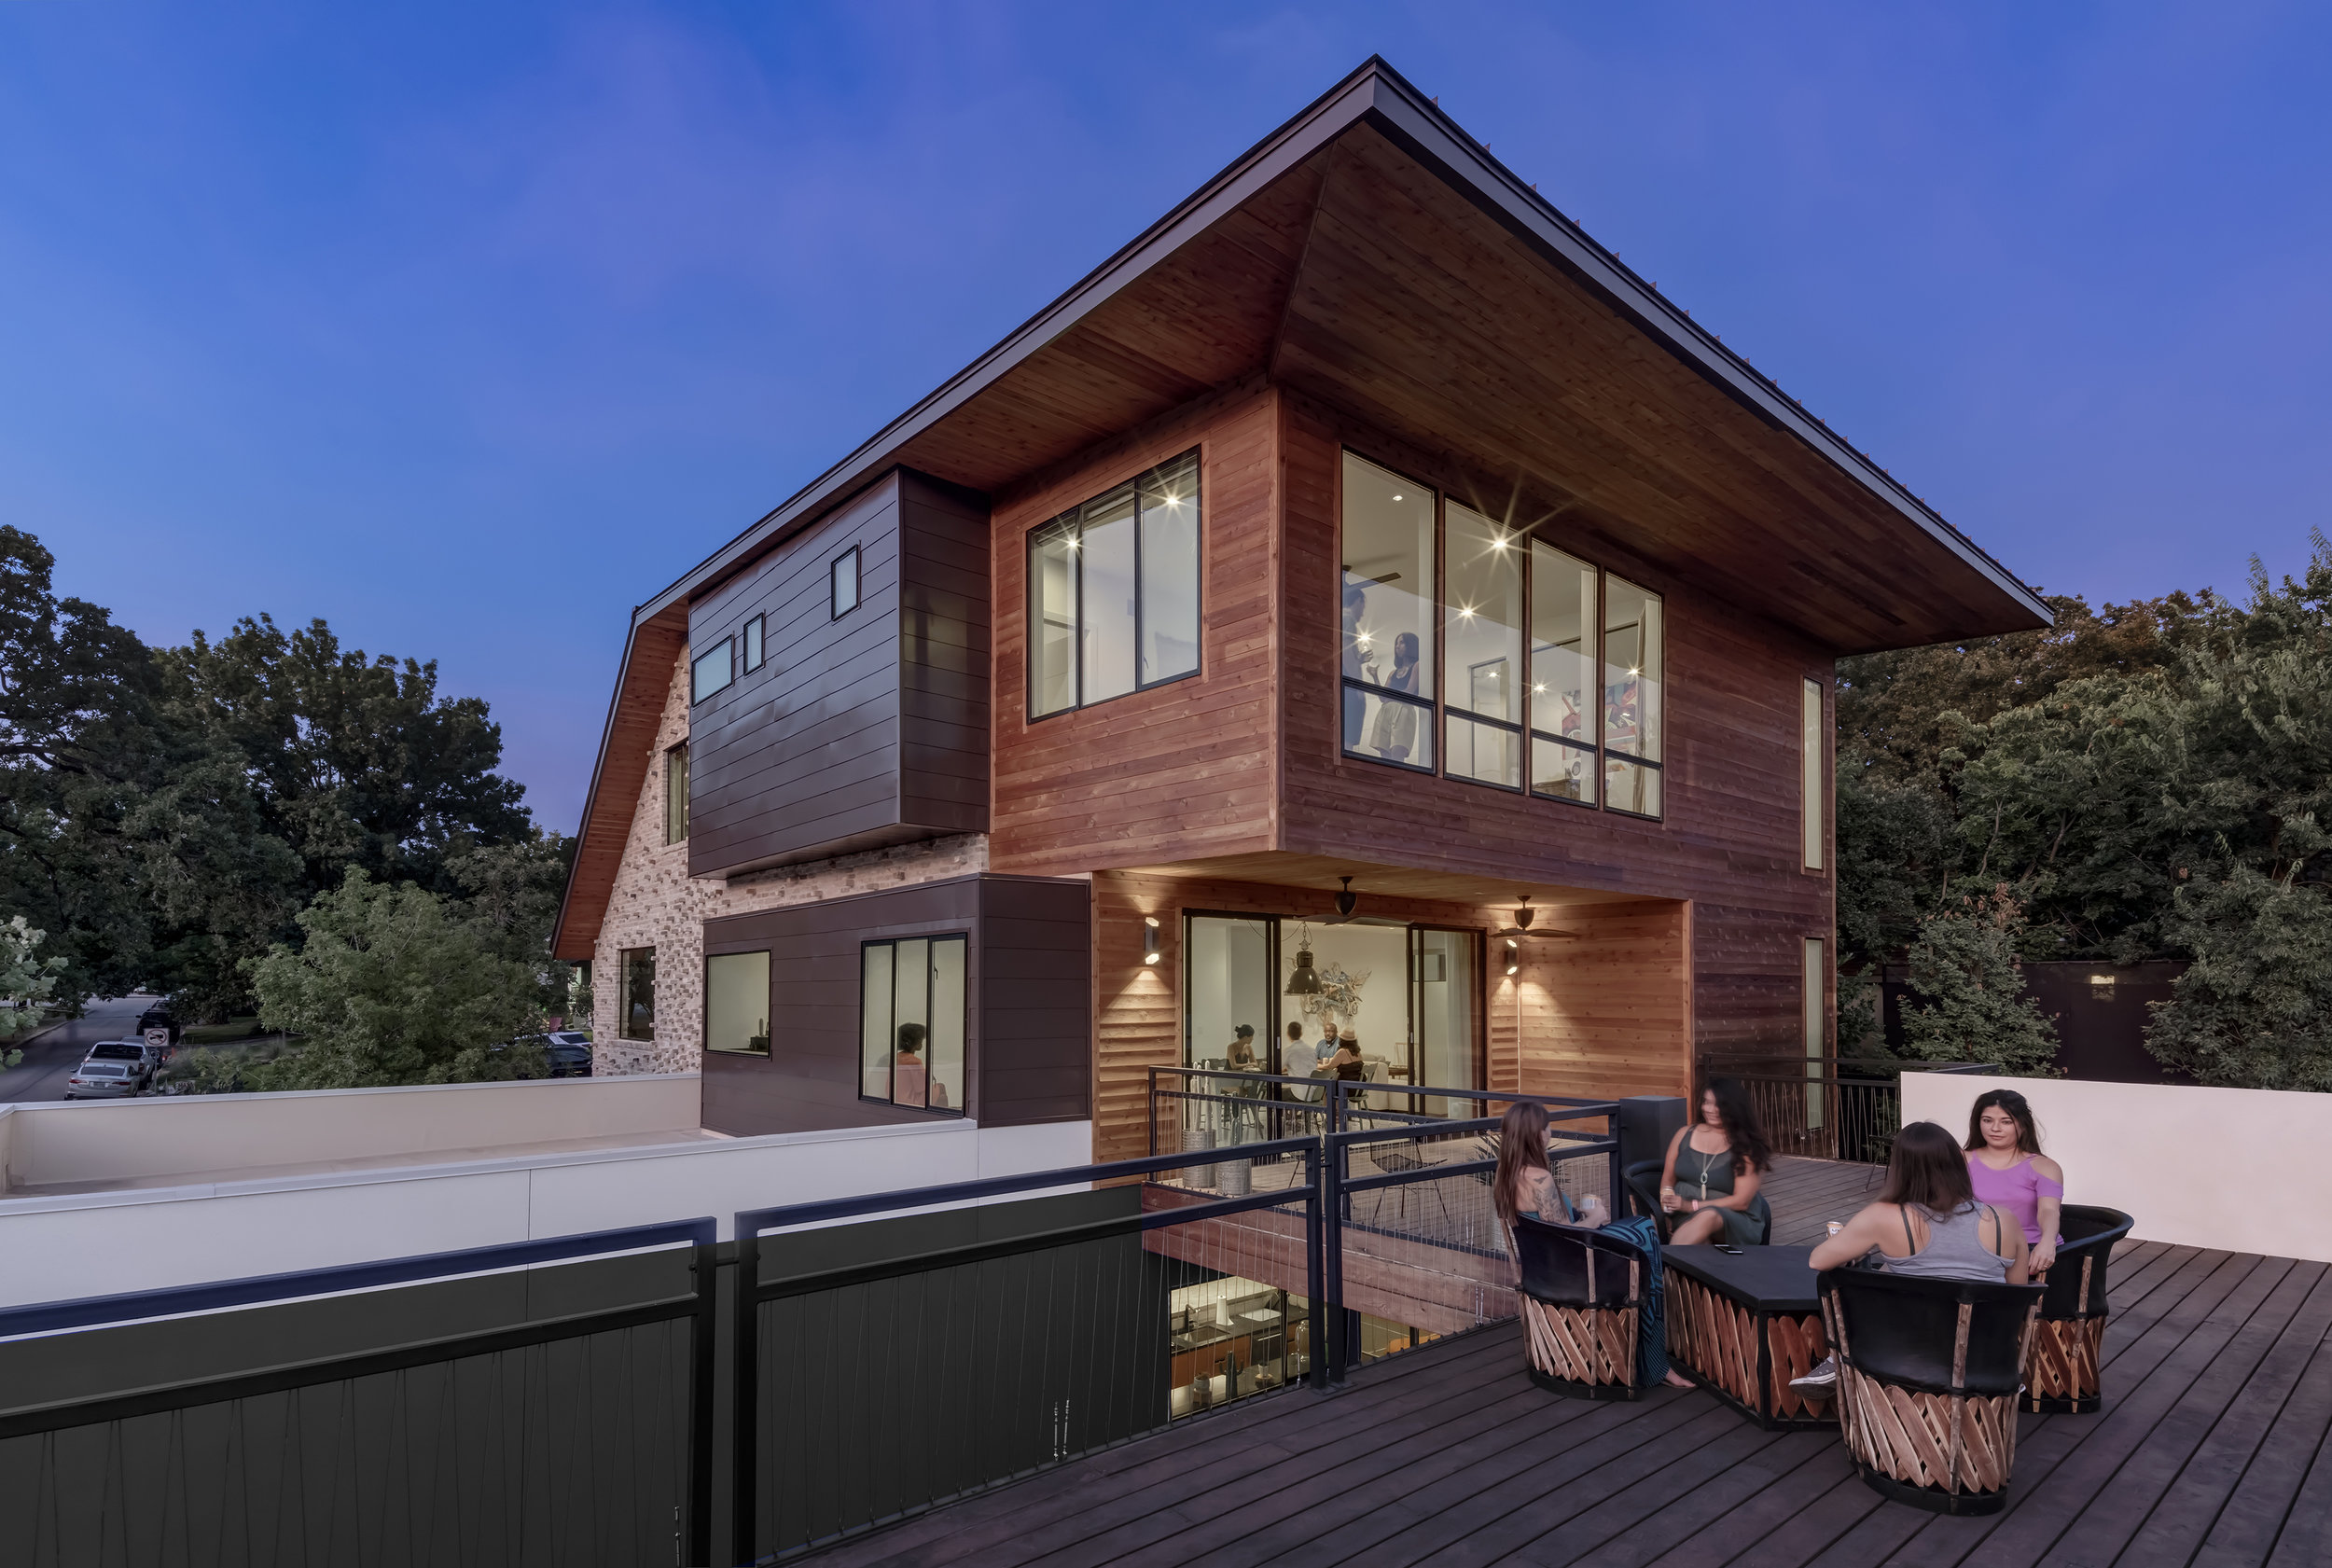 01 Mullet House by Matt Fajkus Architecture. Photo by Charles Davis Smith.jpg